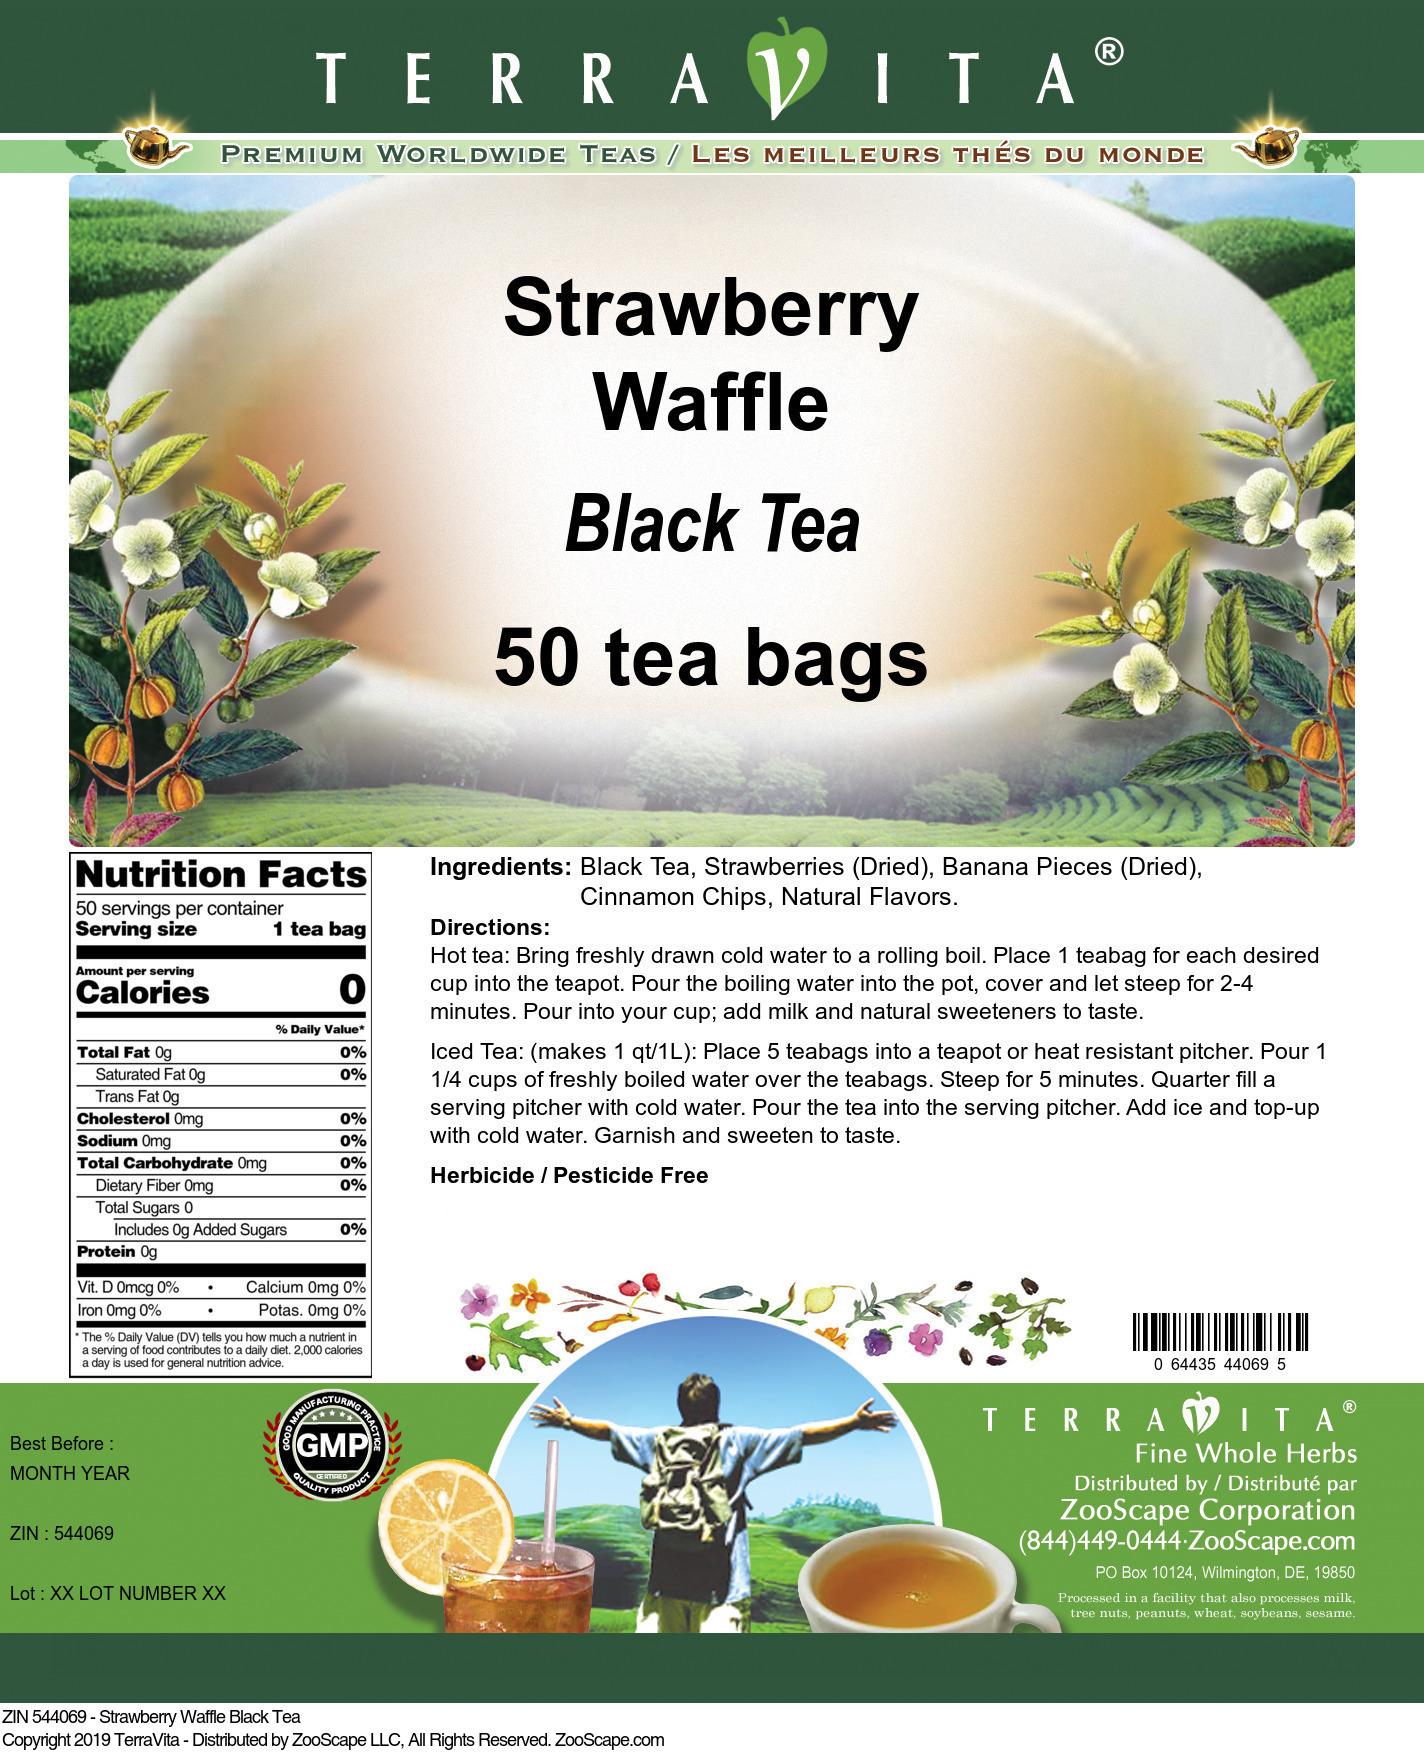 Strawberry Waffle Black Tea